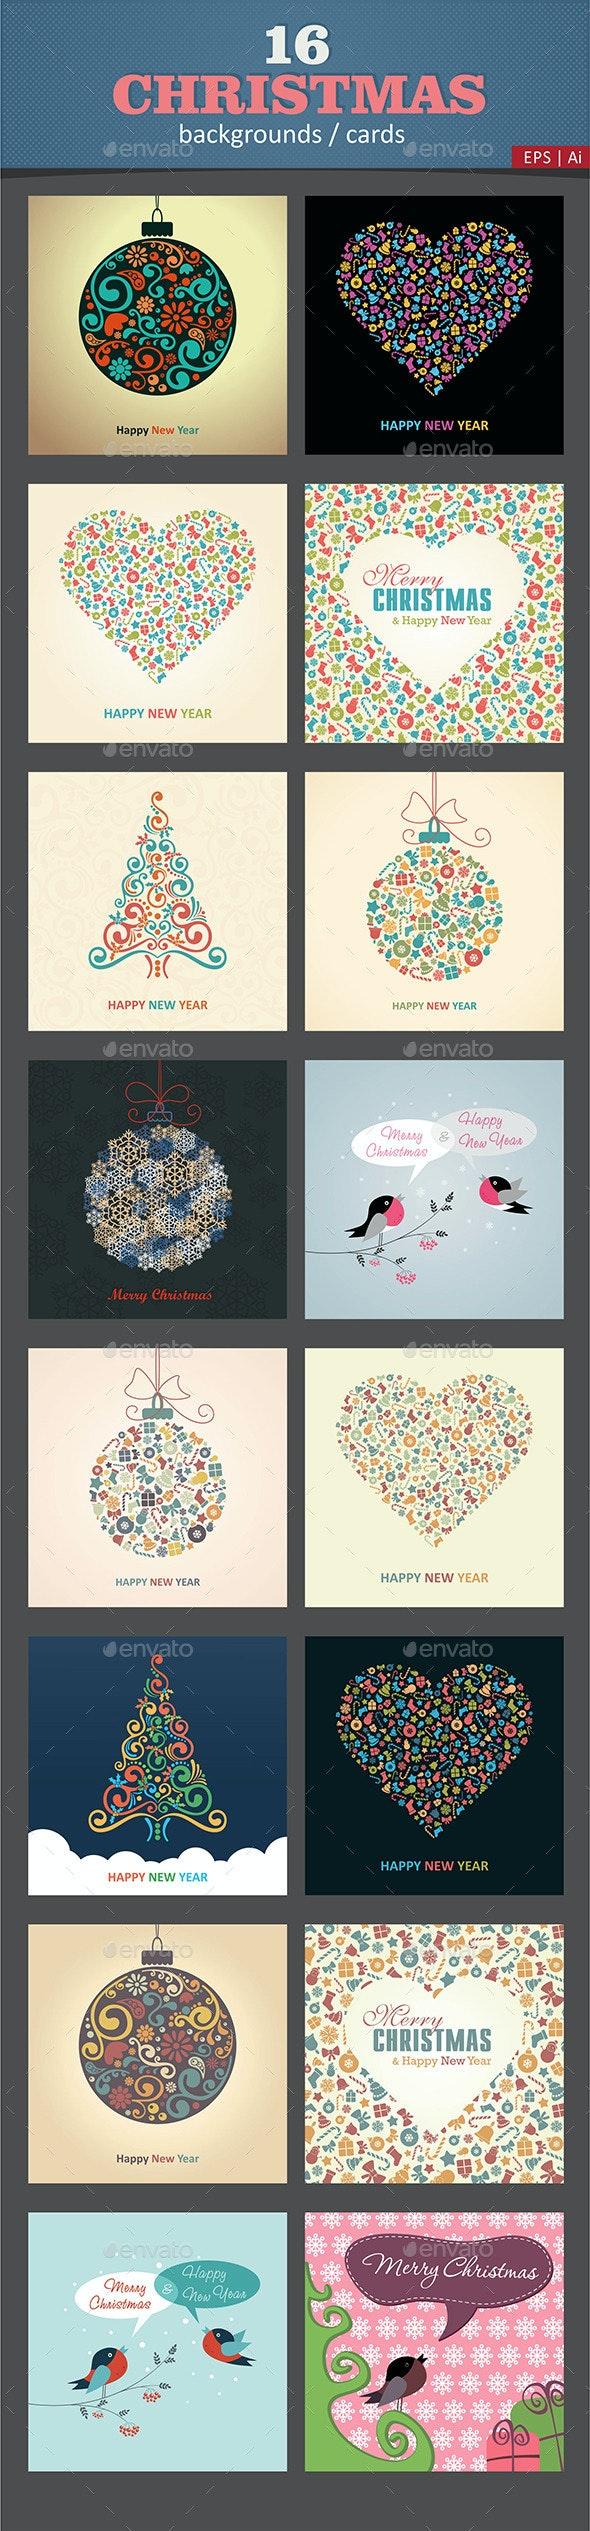 16 Christmas Cards / Backgrounds Vector - Christmas Seasons/Holidays